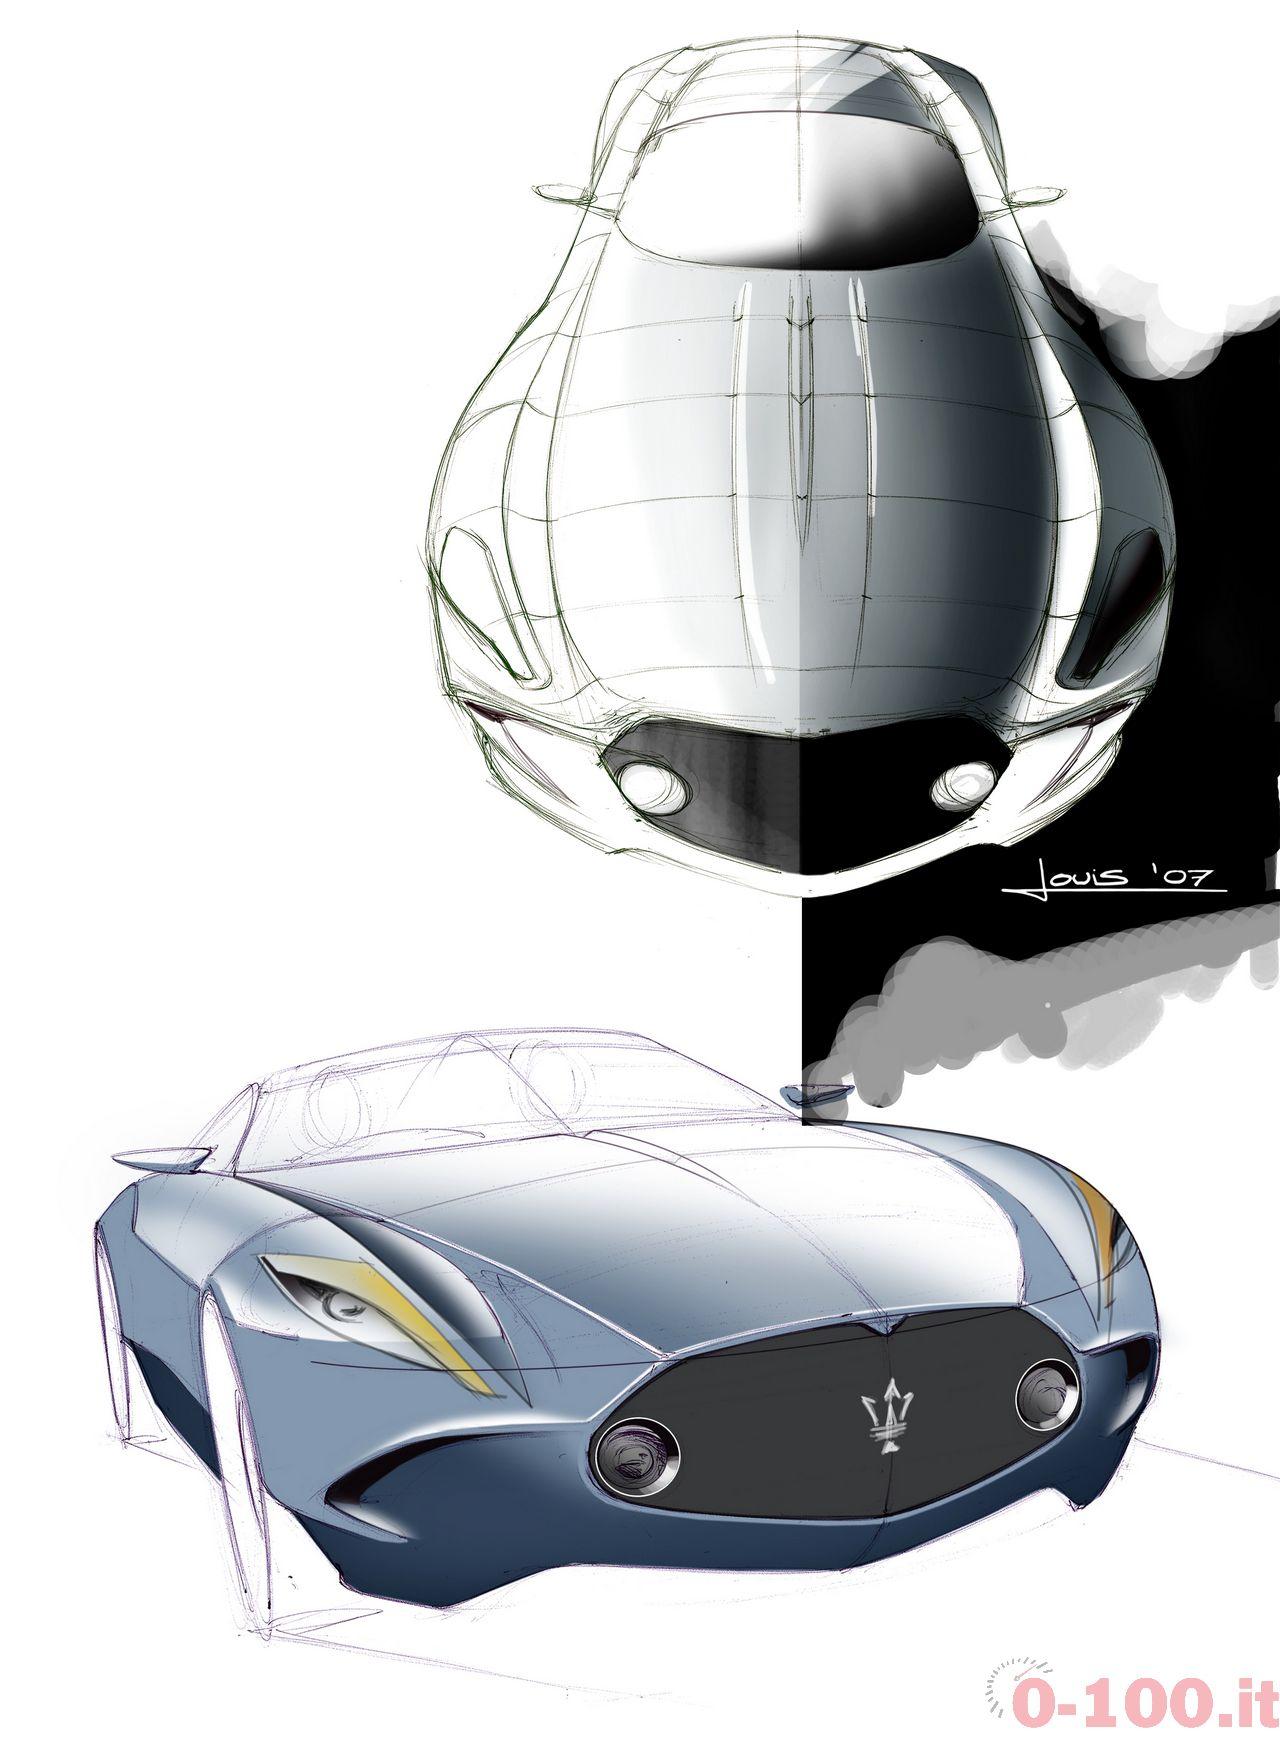 maserati-a8-gcs-touring-superleggera-carrozzeria-0-100_20